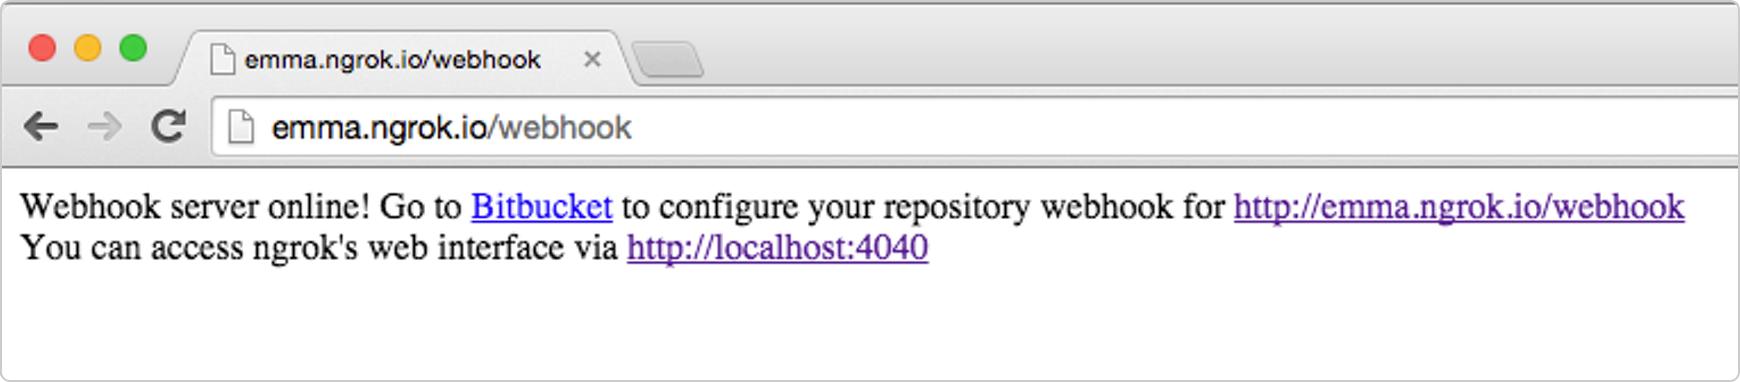 Tutorial: Create and Trigger a Webhook - Atlassian Documentation